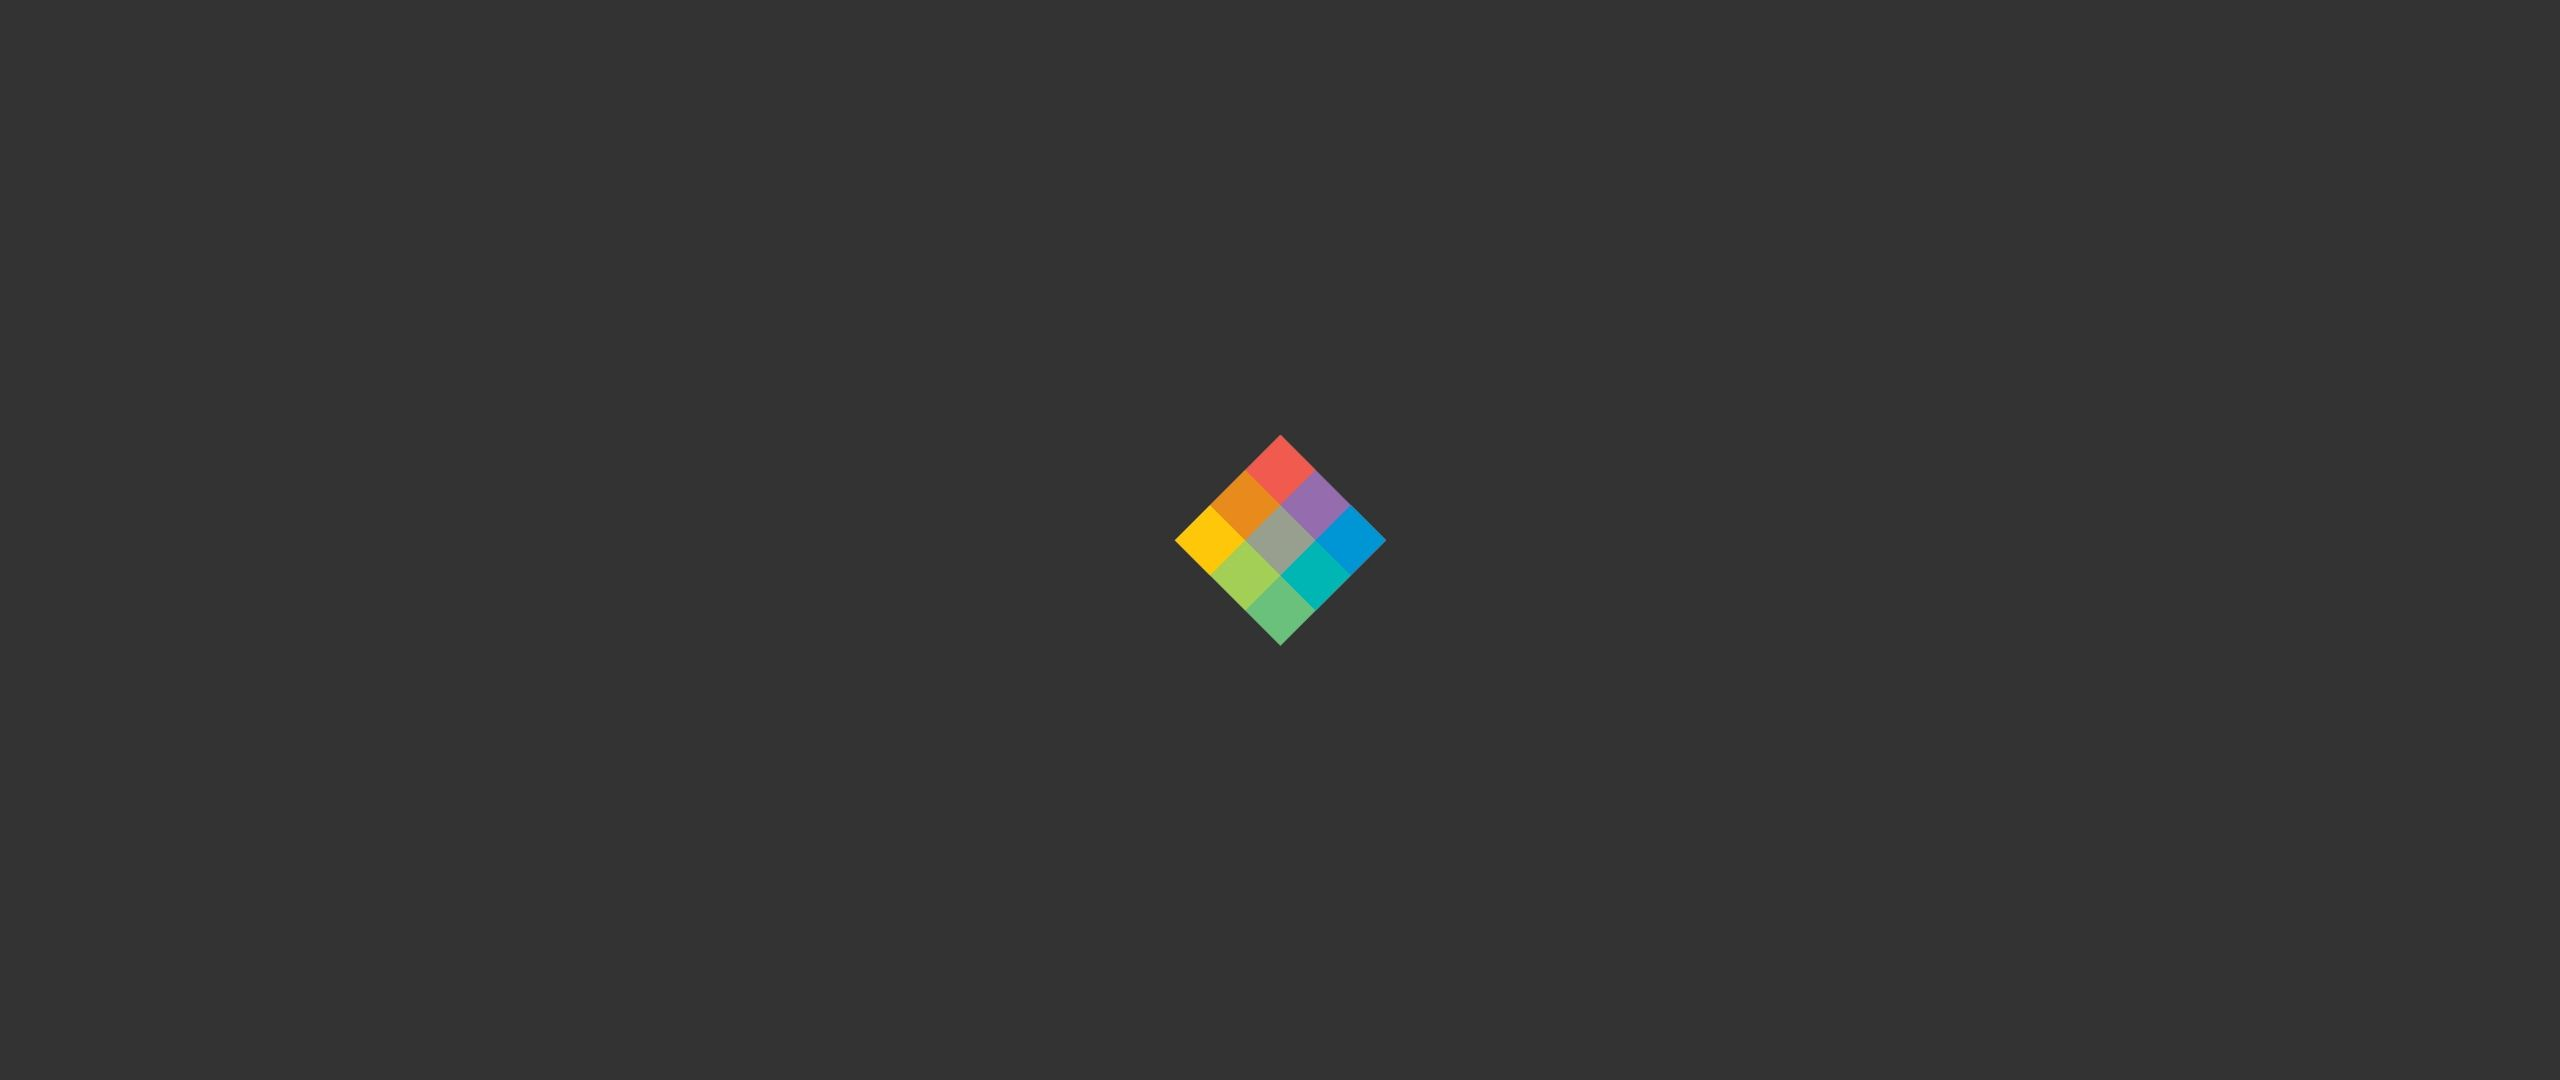 2560x1080 Download wallpaper 2560x1080 minimalist cube, bright, background